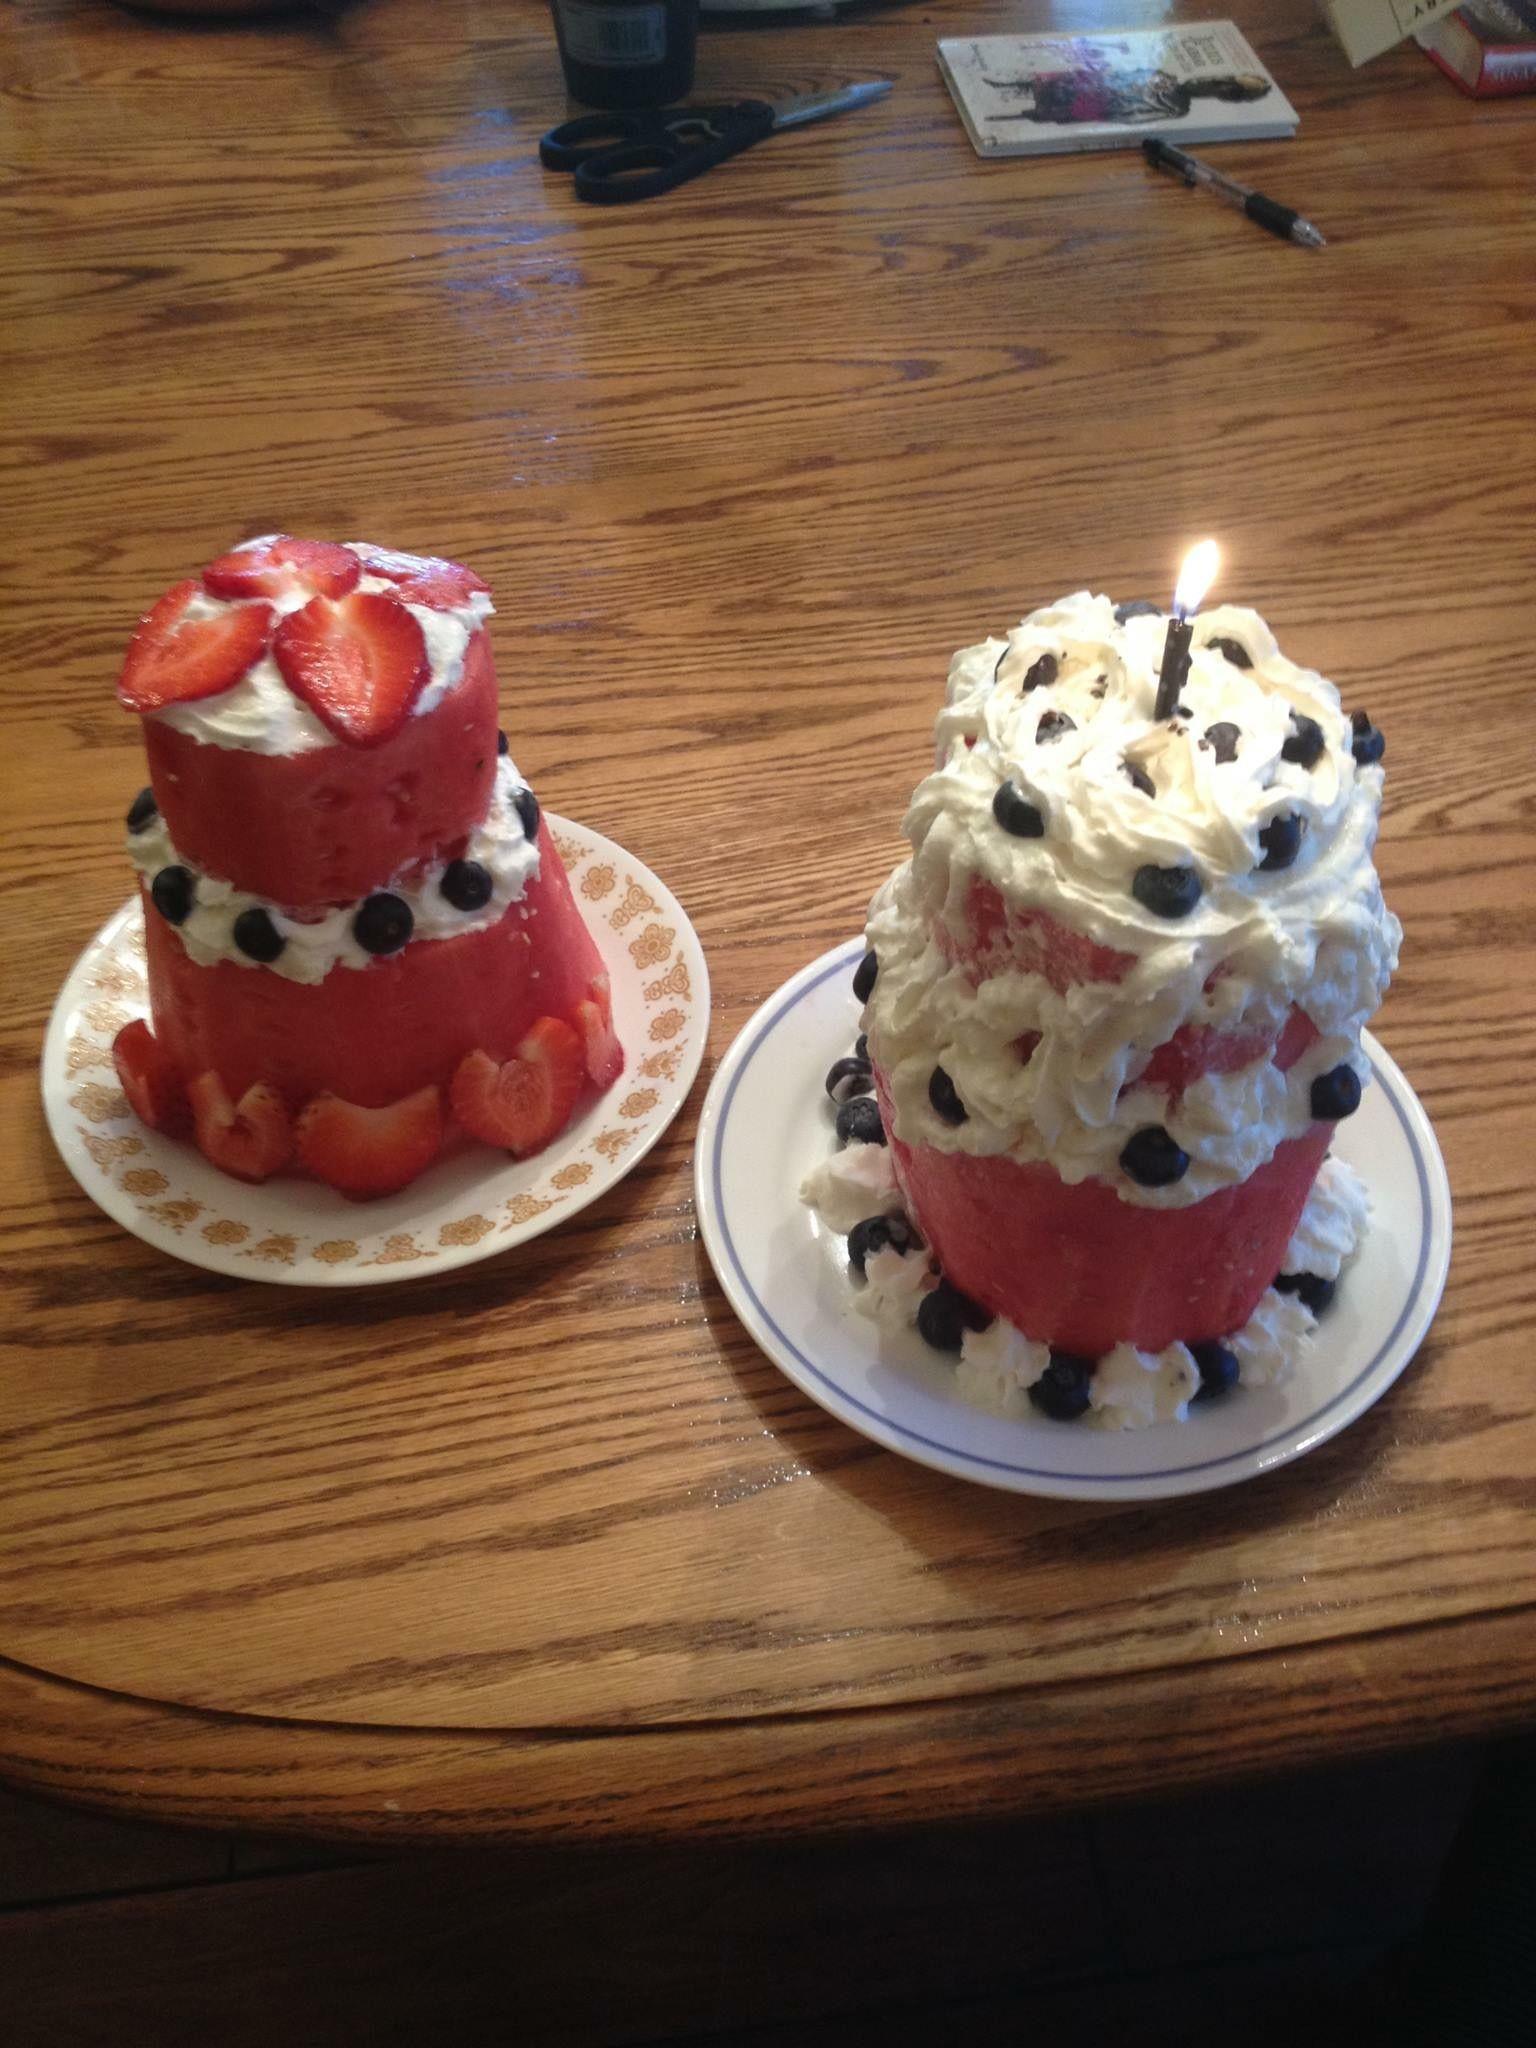 Watermelon birthday cake with strawberries & blueberries ...